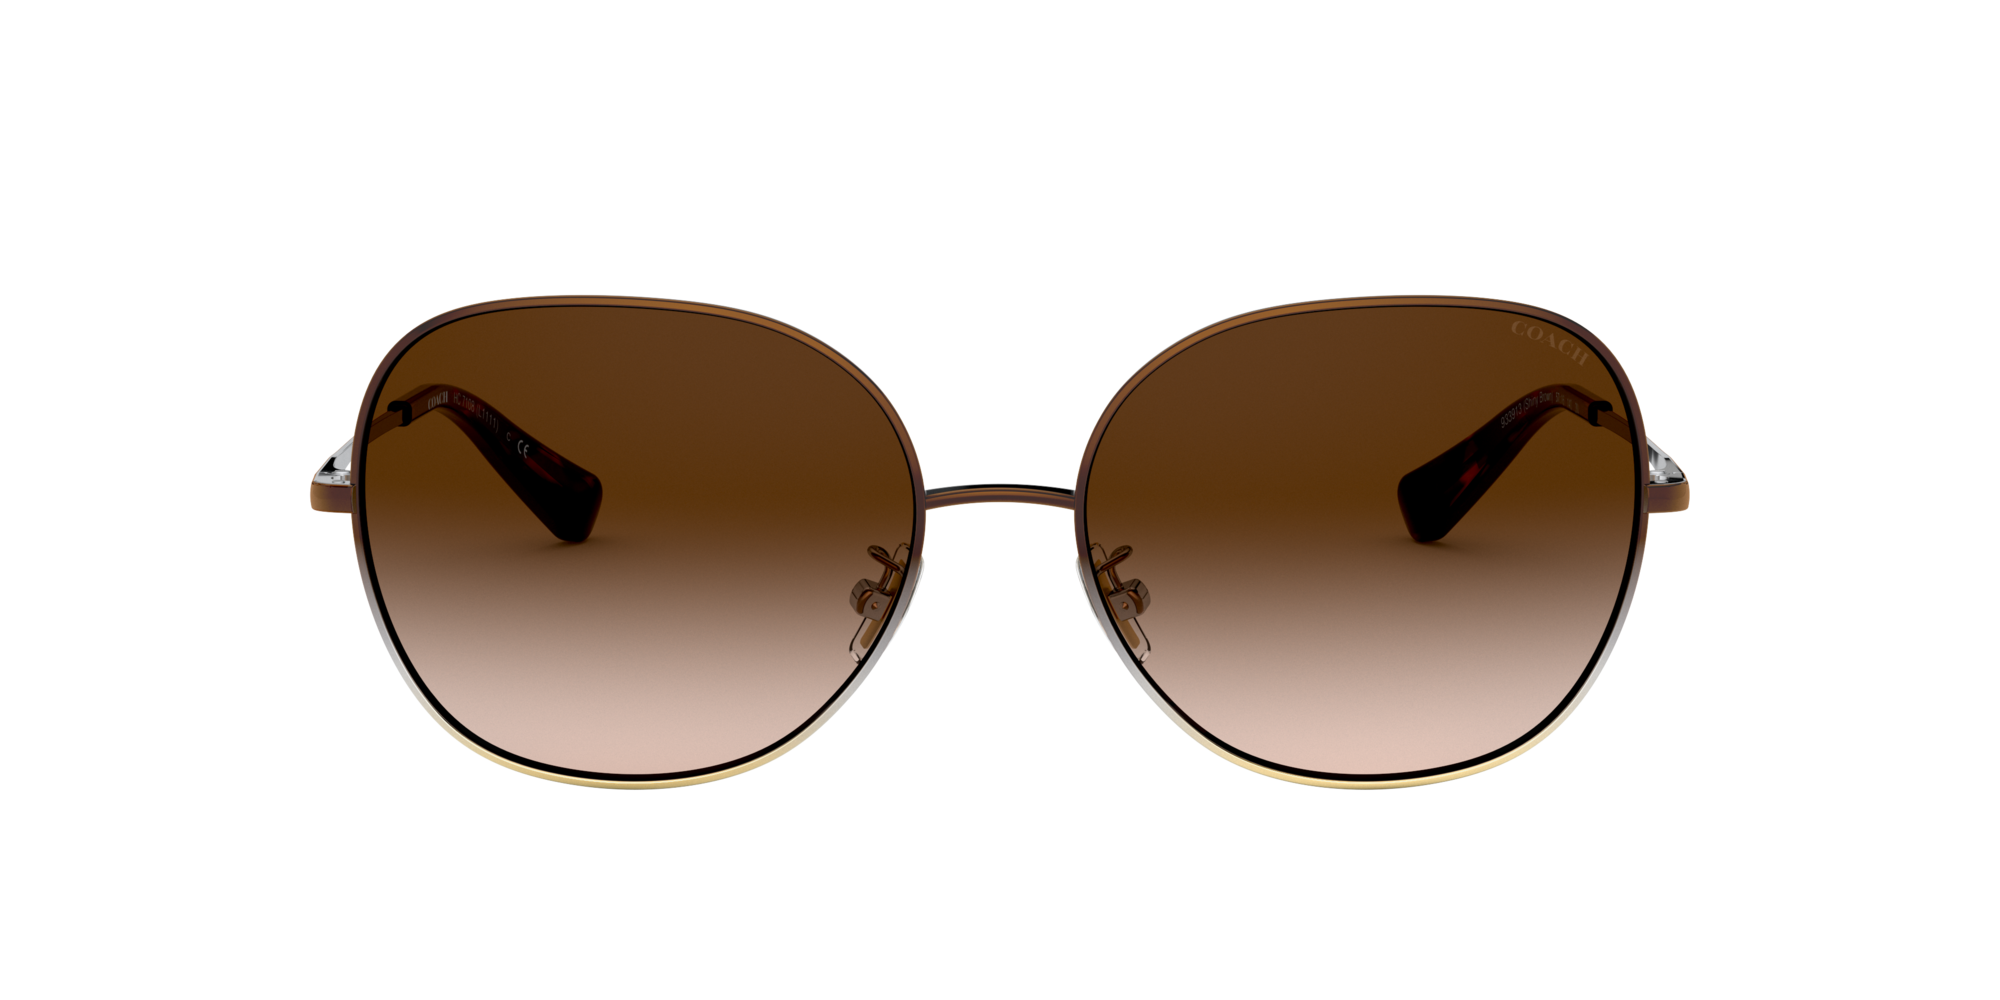 Image for HC7108 57 L1111 from LensCrafters | Glasses, Prescription Glasses Online, Eyewear